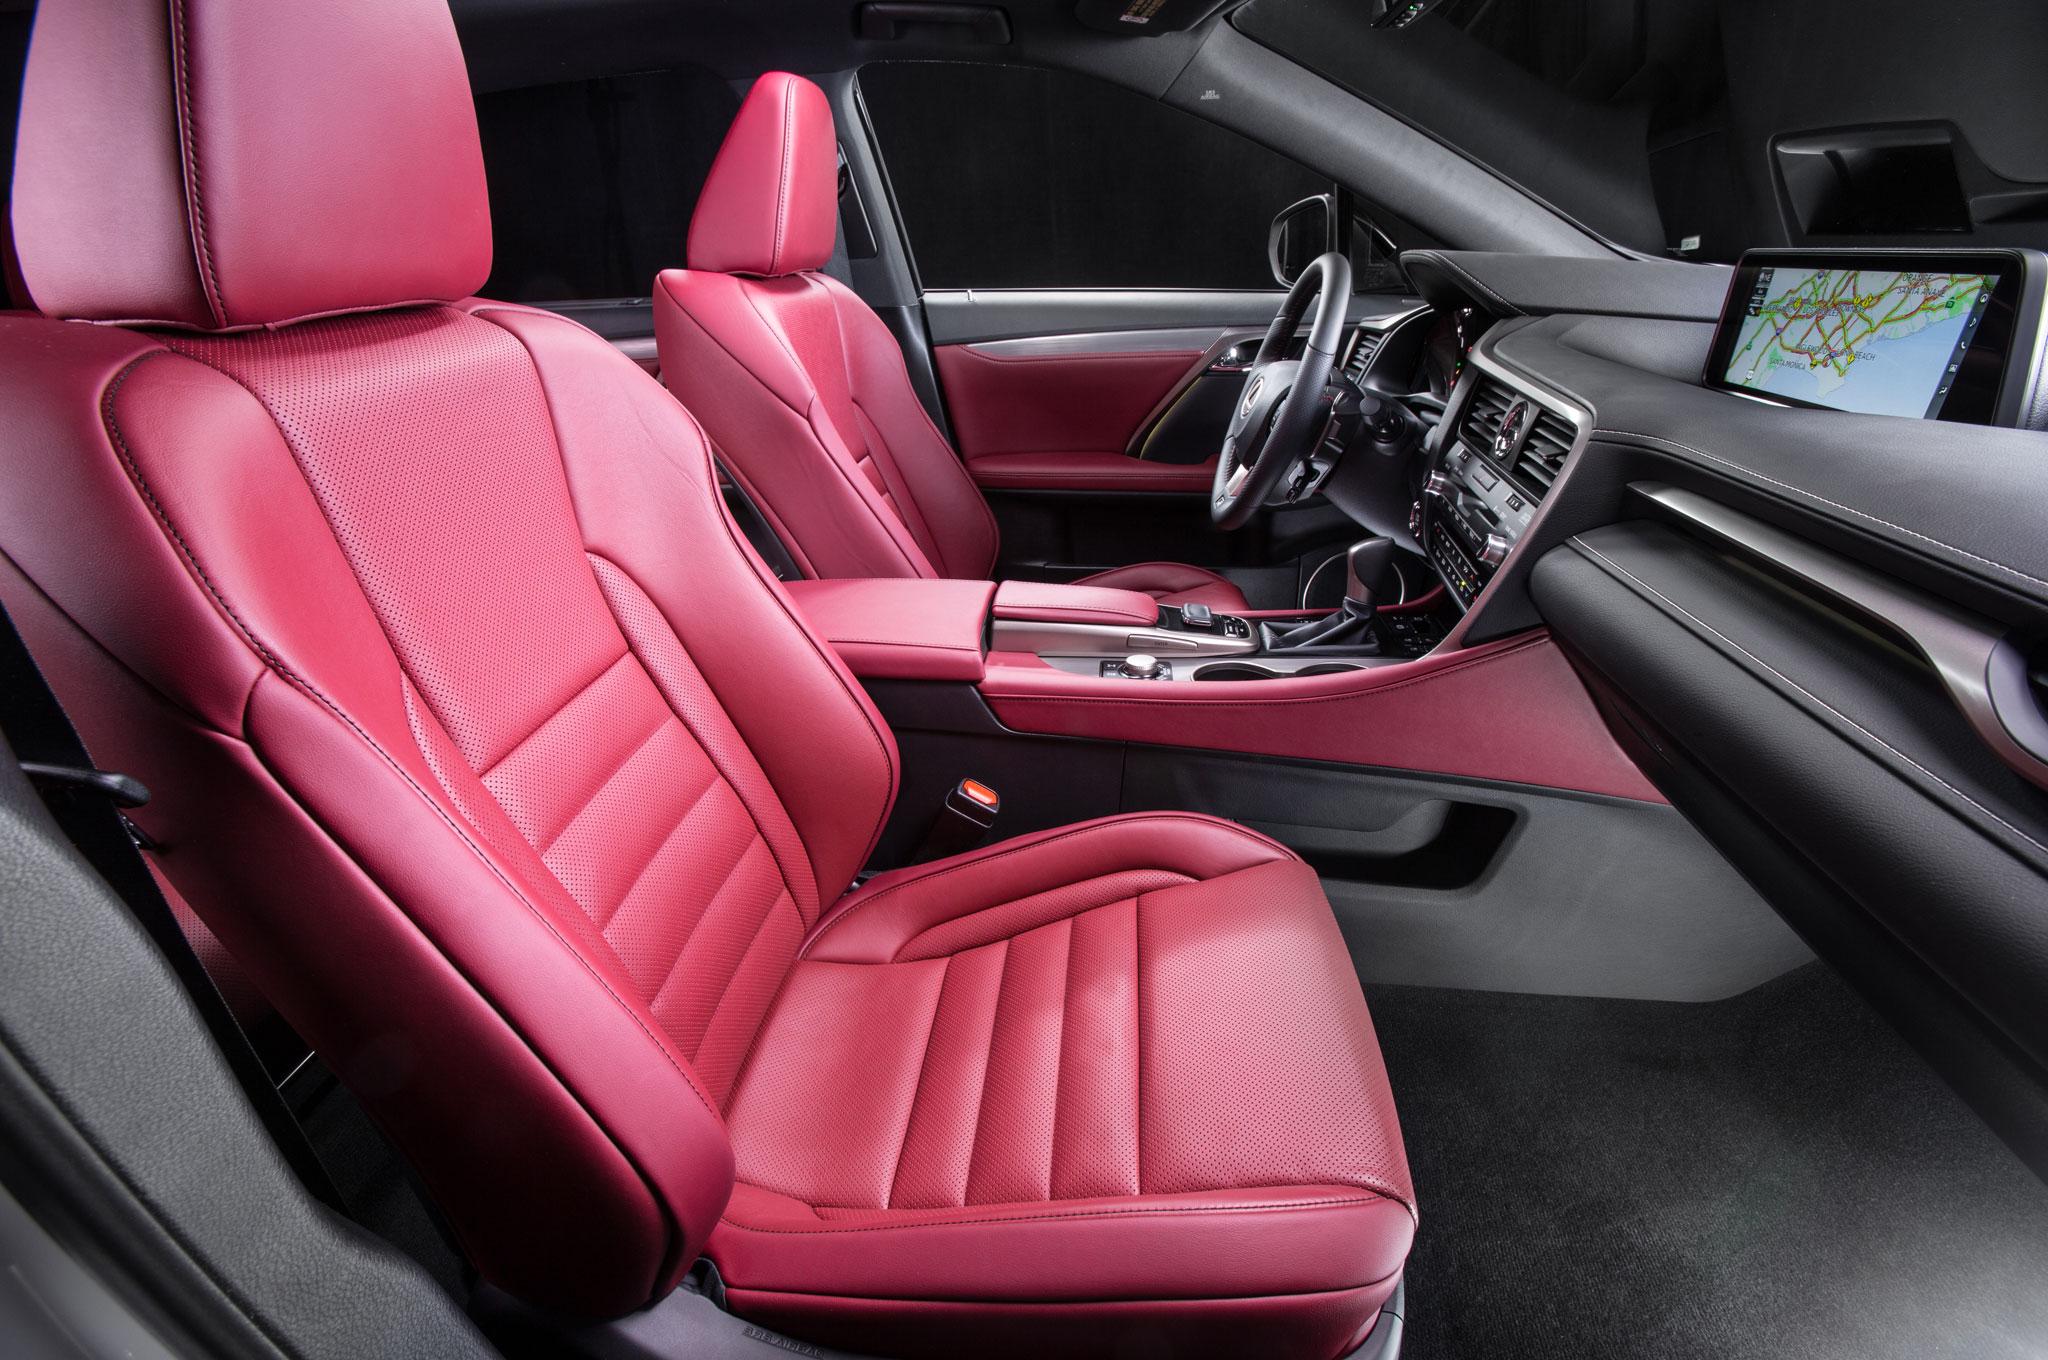 http://st.automobilemag.com/uploads/sites/11/2015/09/2016-Lexus-RX-350-AWD-F-Sport-cabin-02.jpg